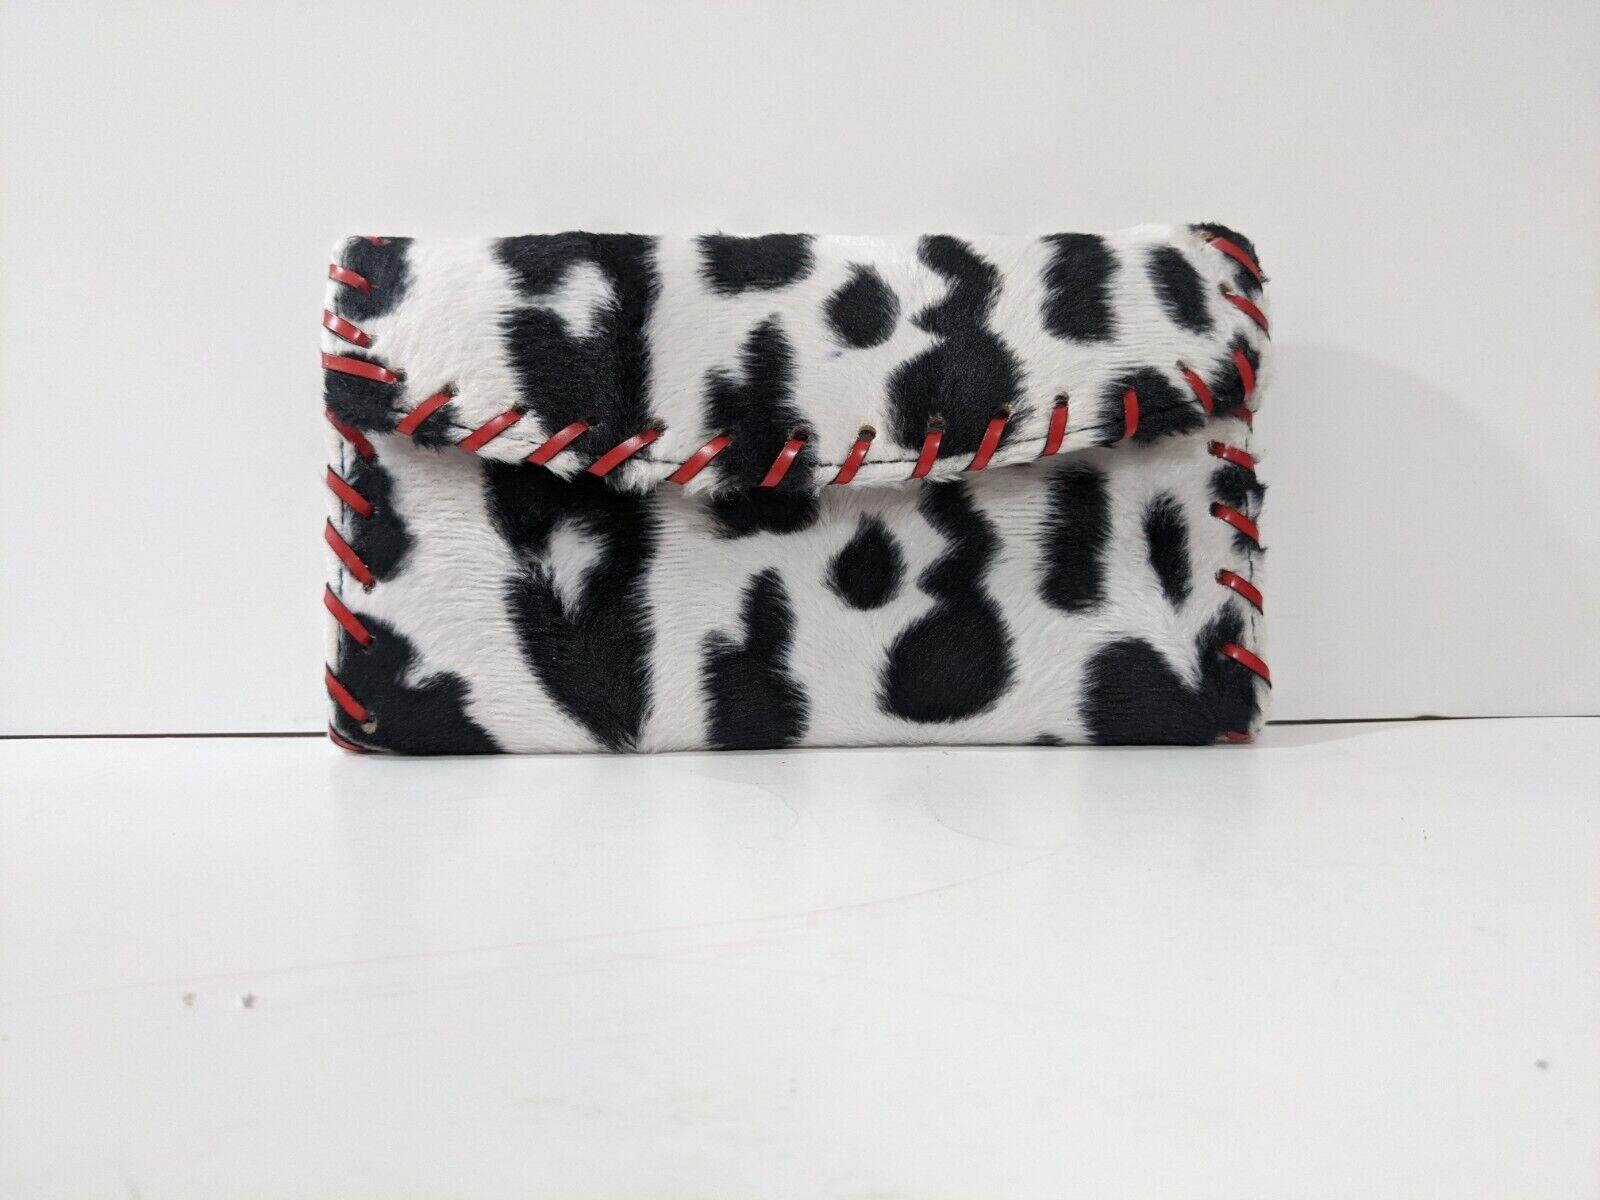 Cow Print Design Women's Wallet Billfold Checkbook Holder